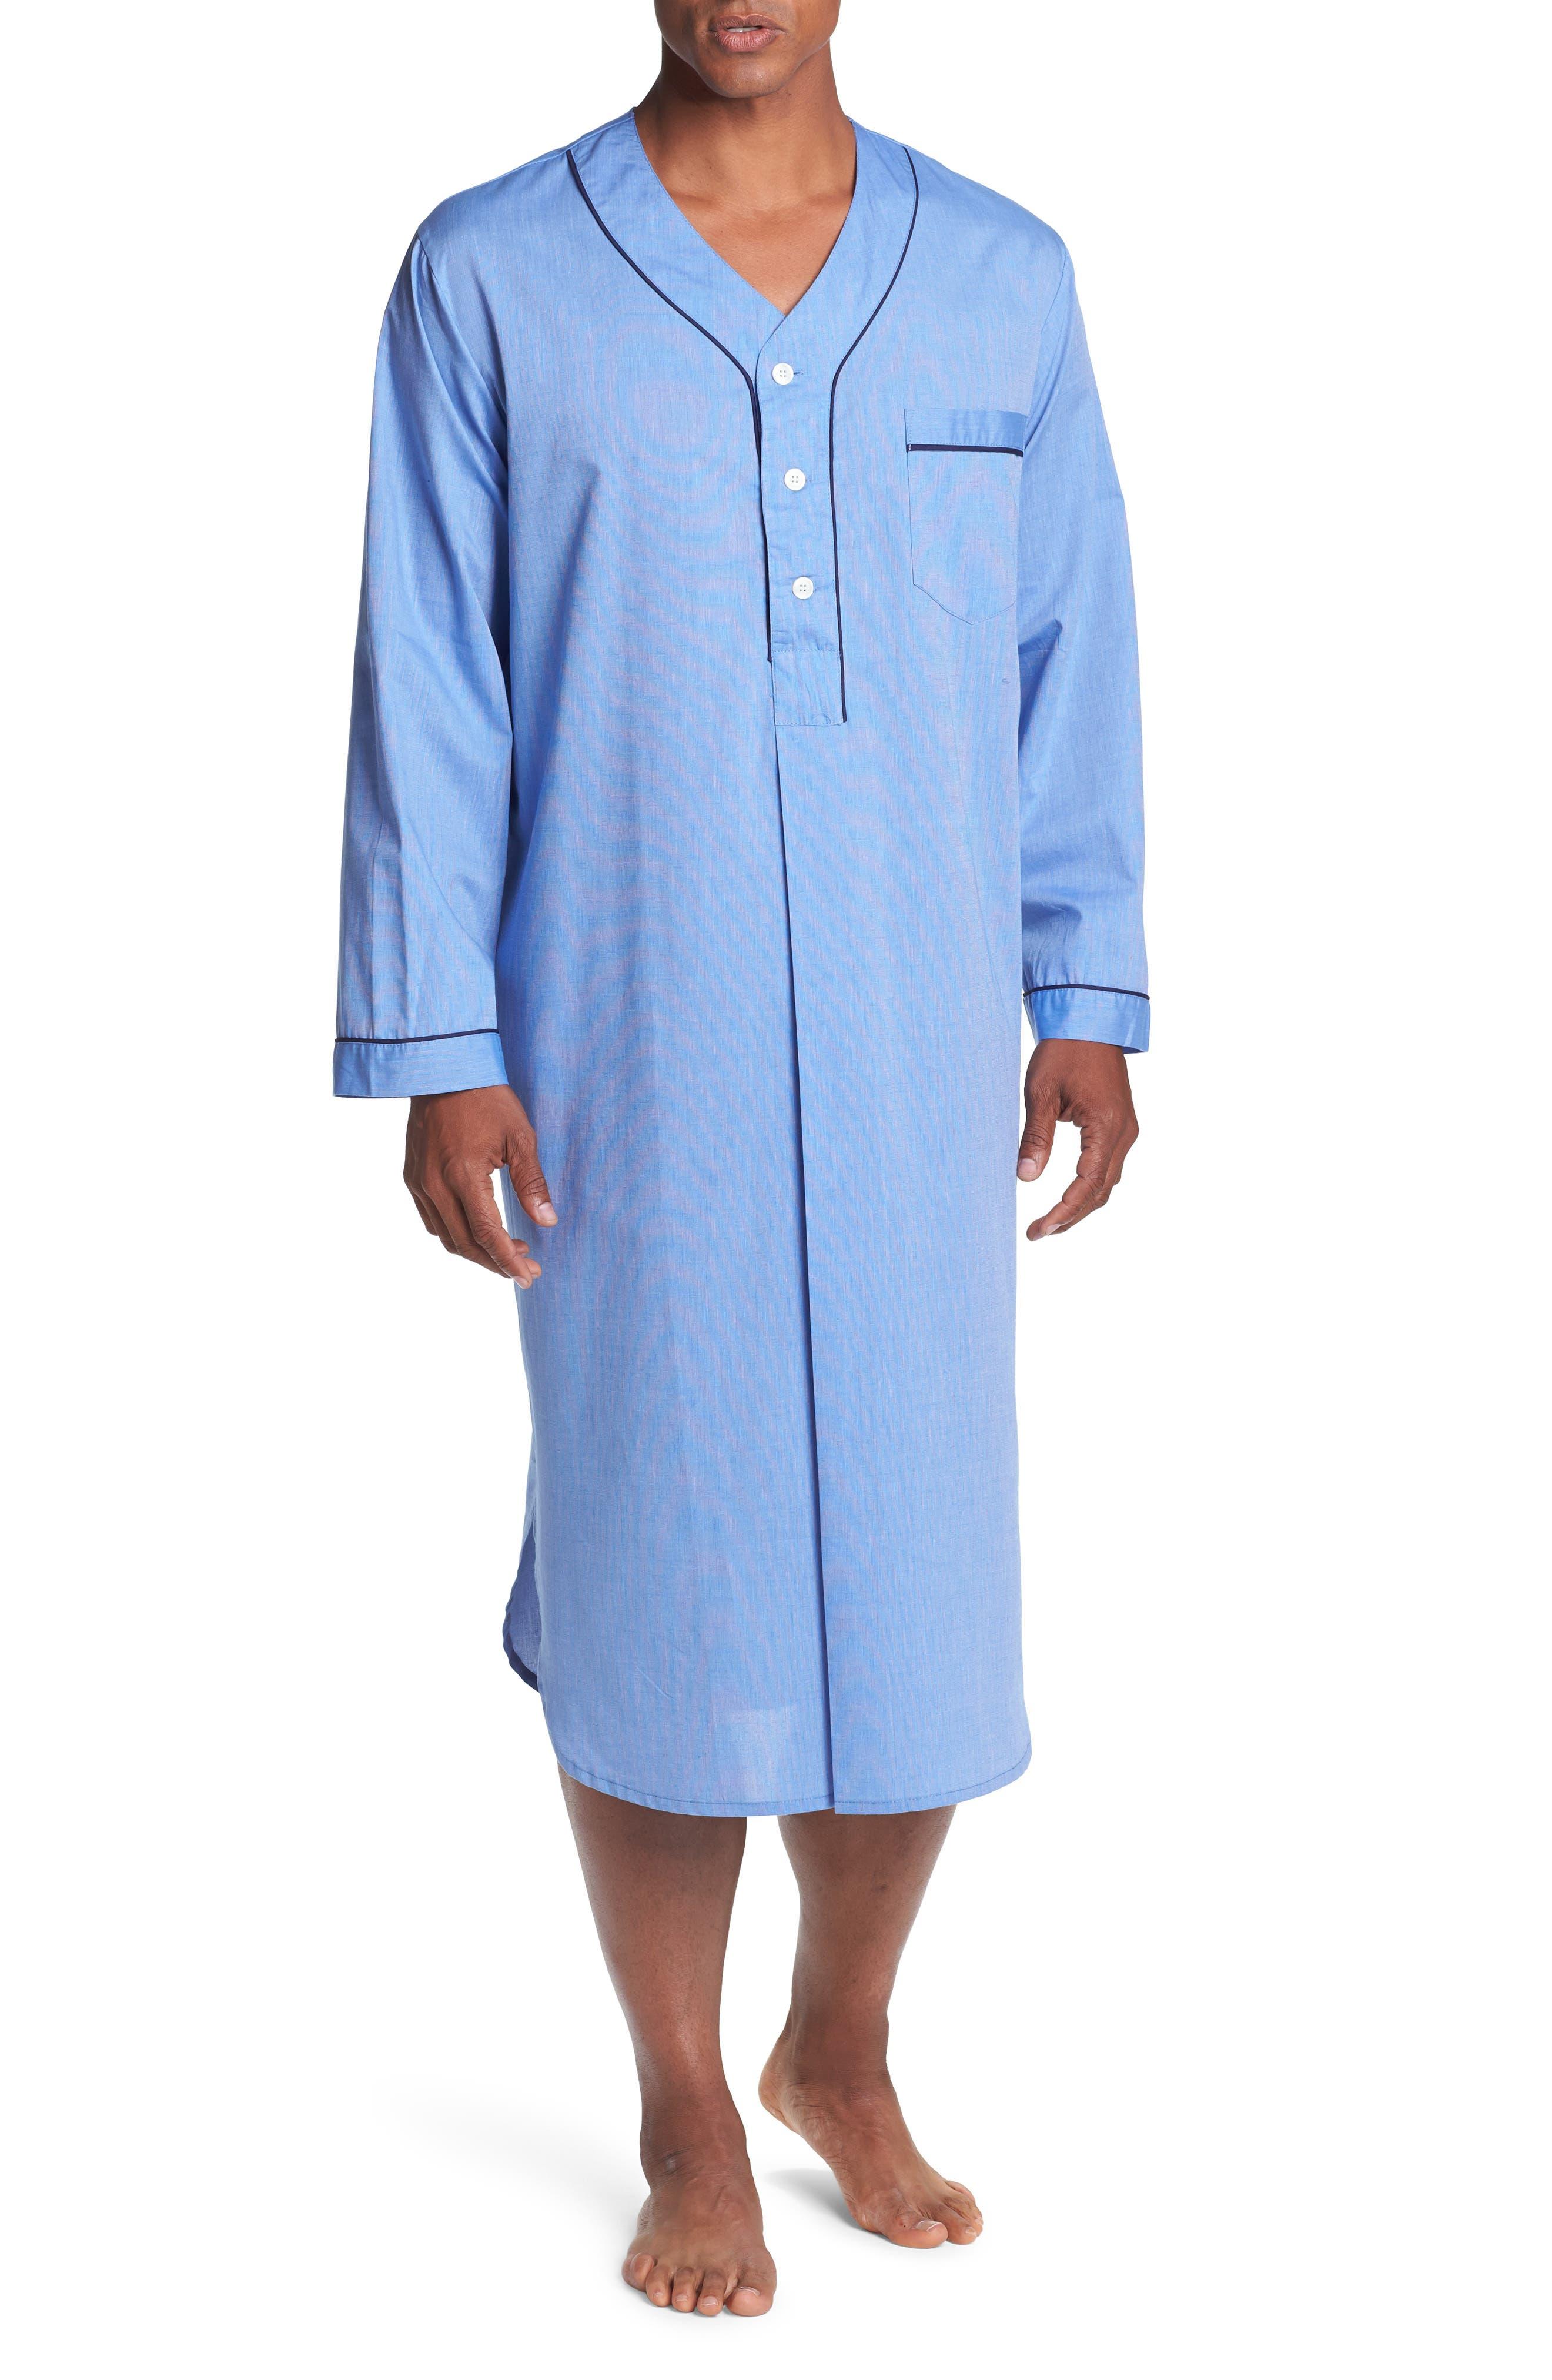 1930s Men's Fashion Guide- What Did Men Wear? Mens Majestic International Cotton Nightshirt $60.00 AT vintagedancer.com